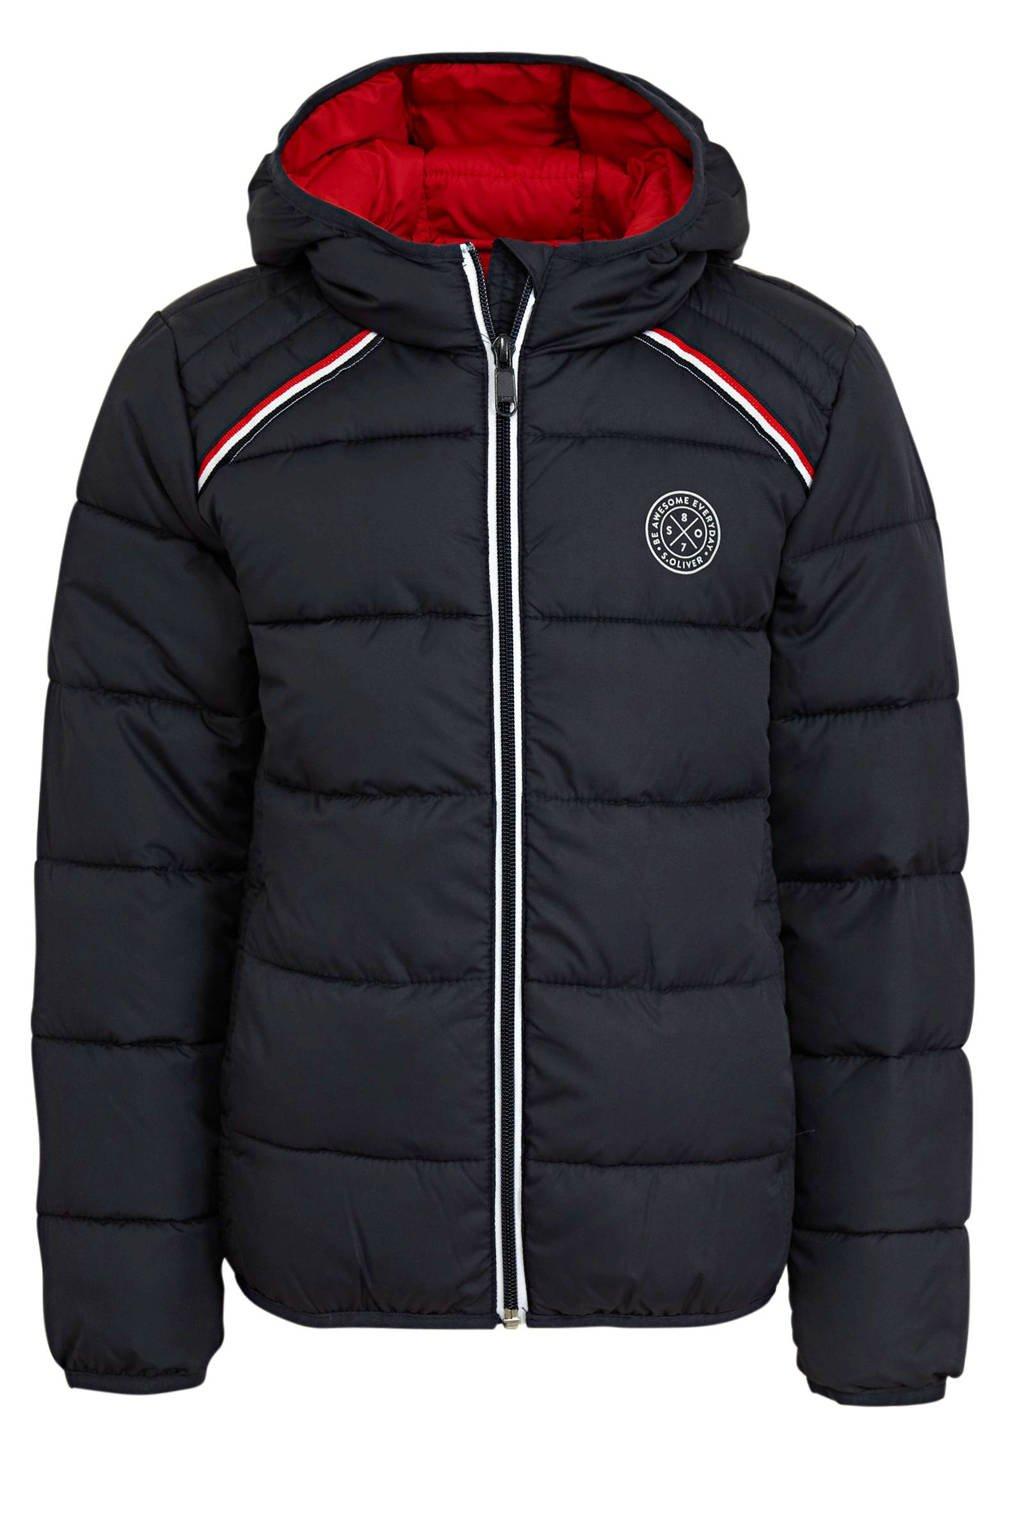 s.Oliver gewatteerde jas met logo donkerblauw, Donkerblauw